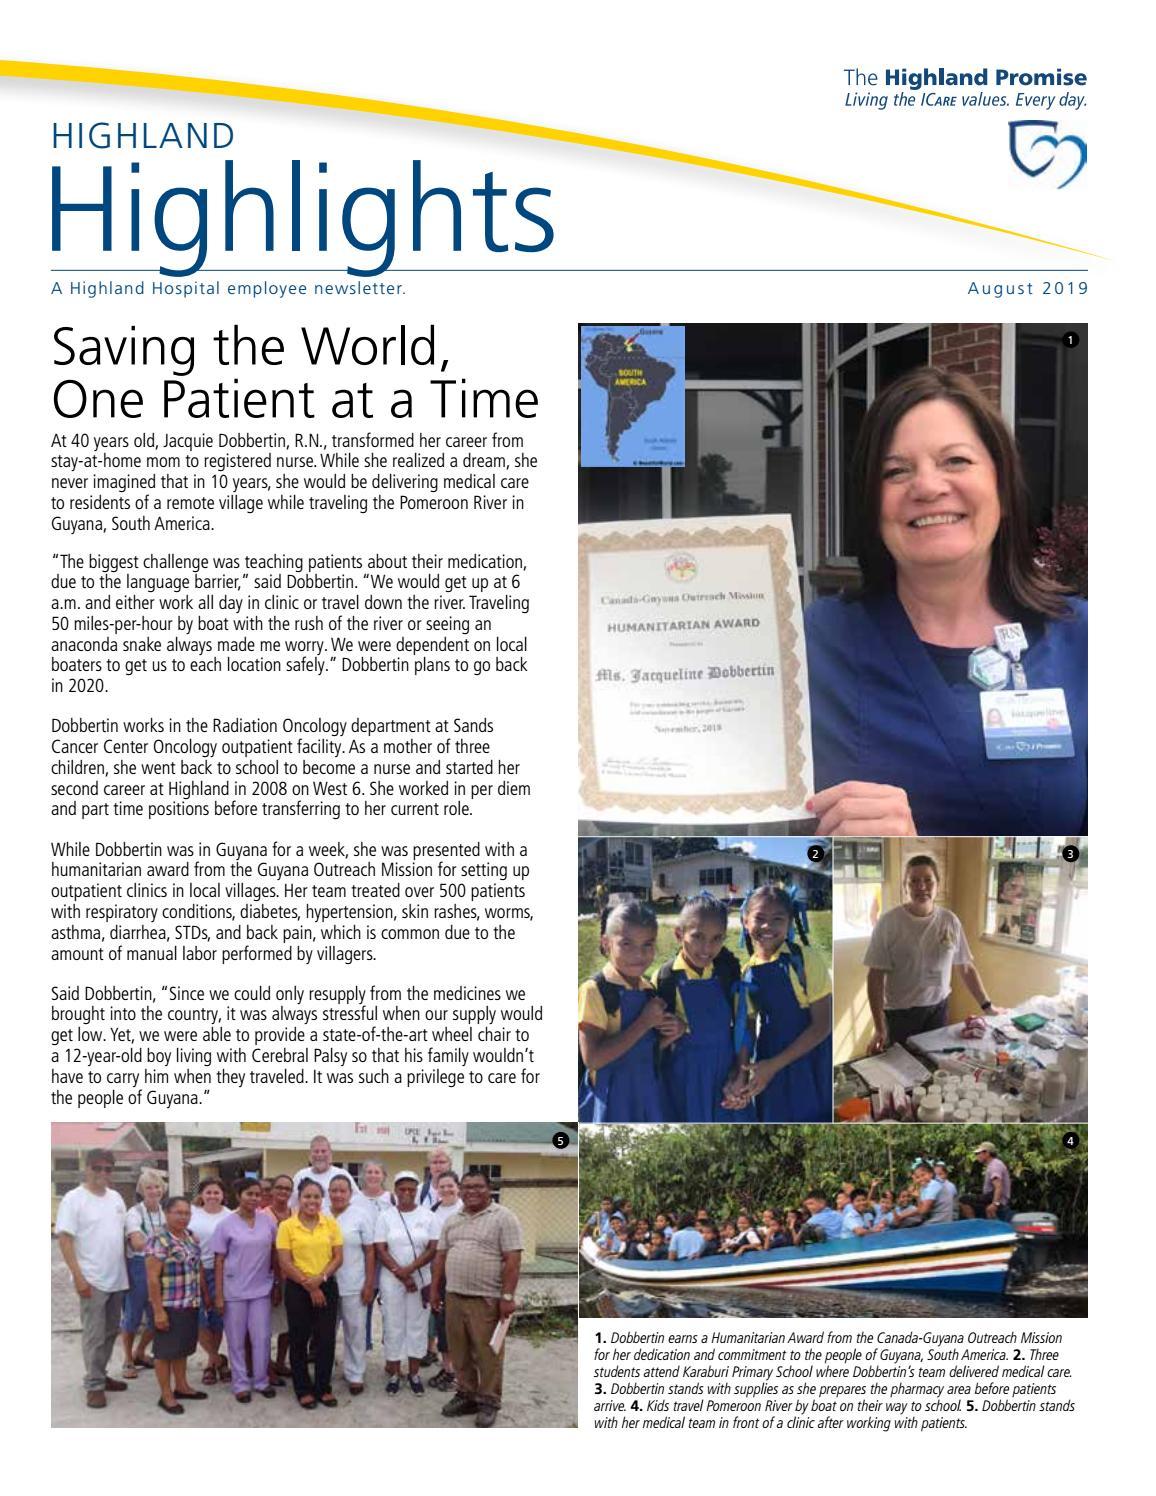 Highland Highlights August 2019 by Highland Hospital - issuu